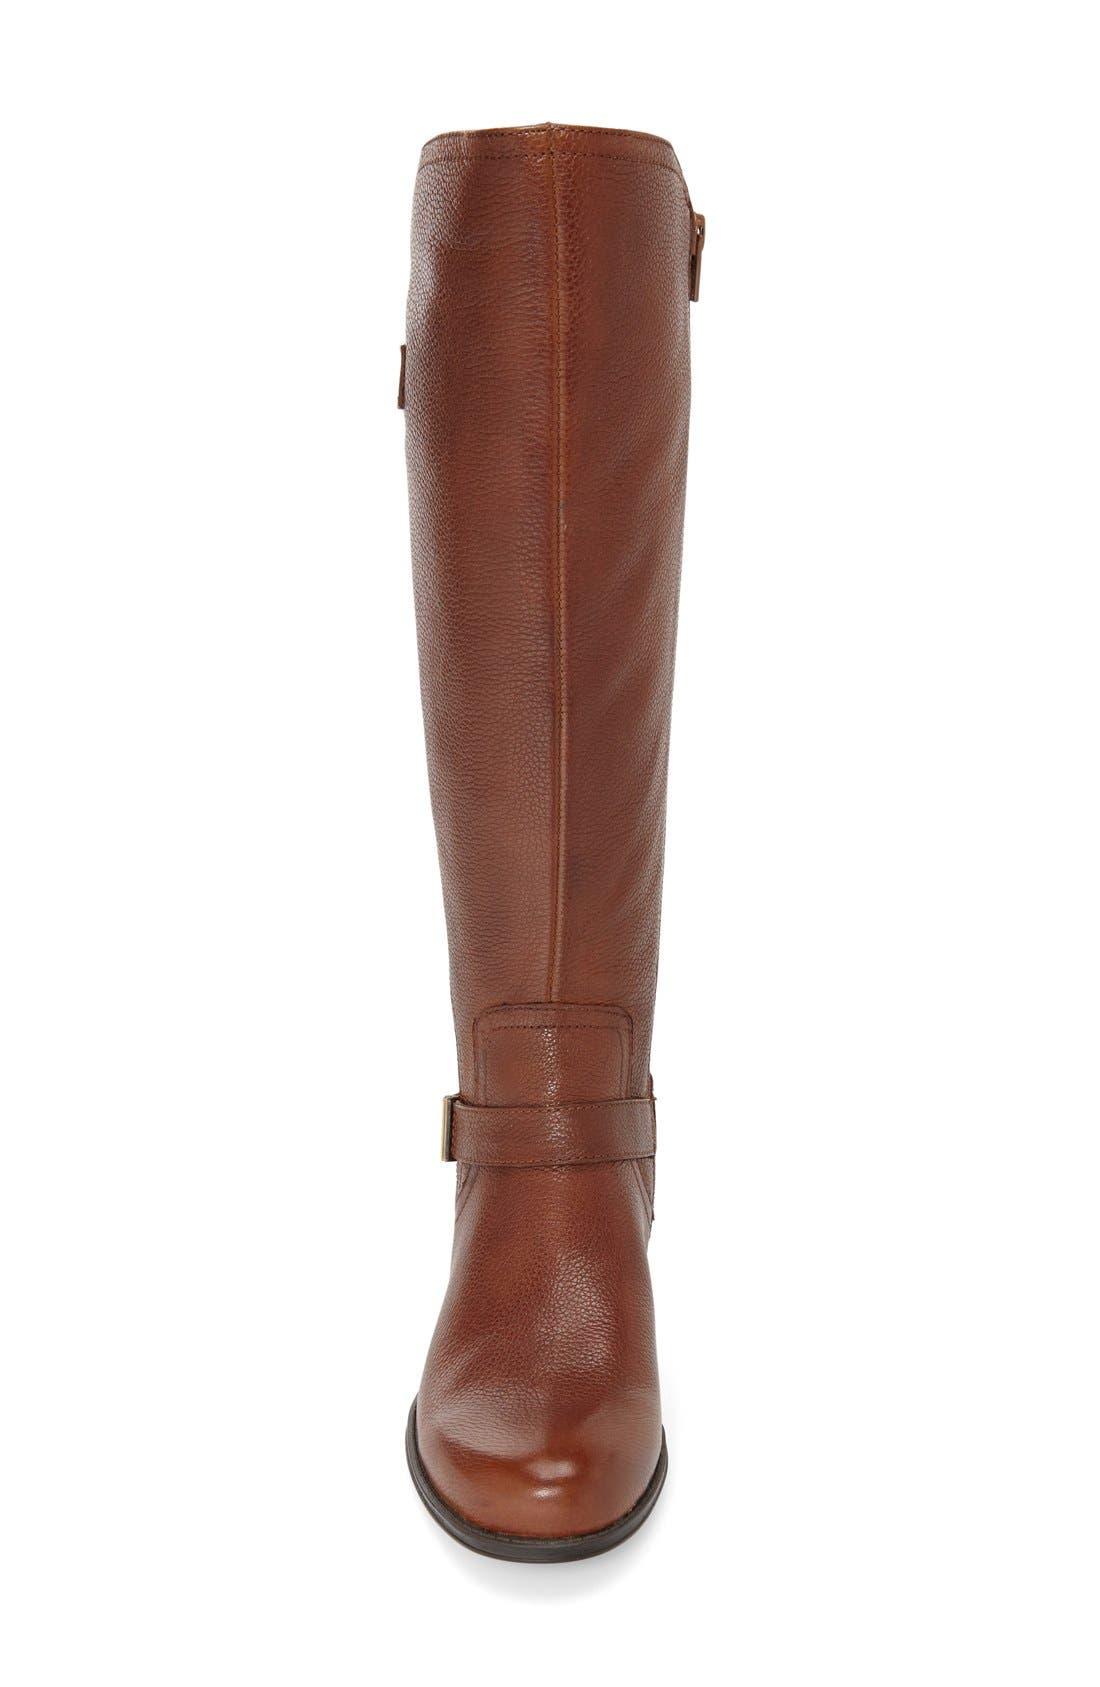 Alternate Image 3  - Naturalizer 'Joan' Riding Boot (Women) (Wide Calf)